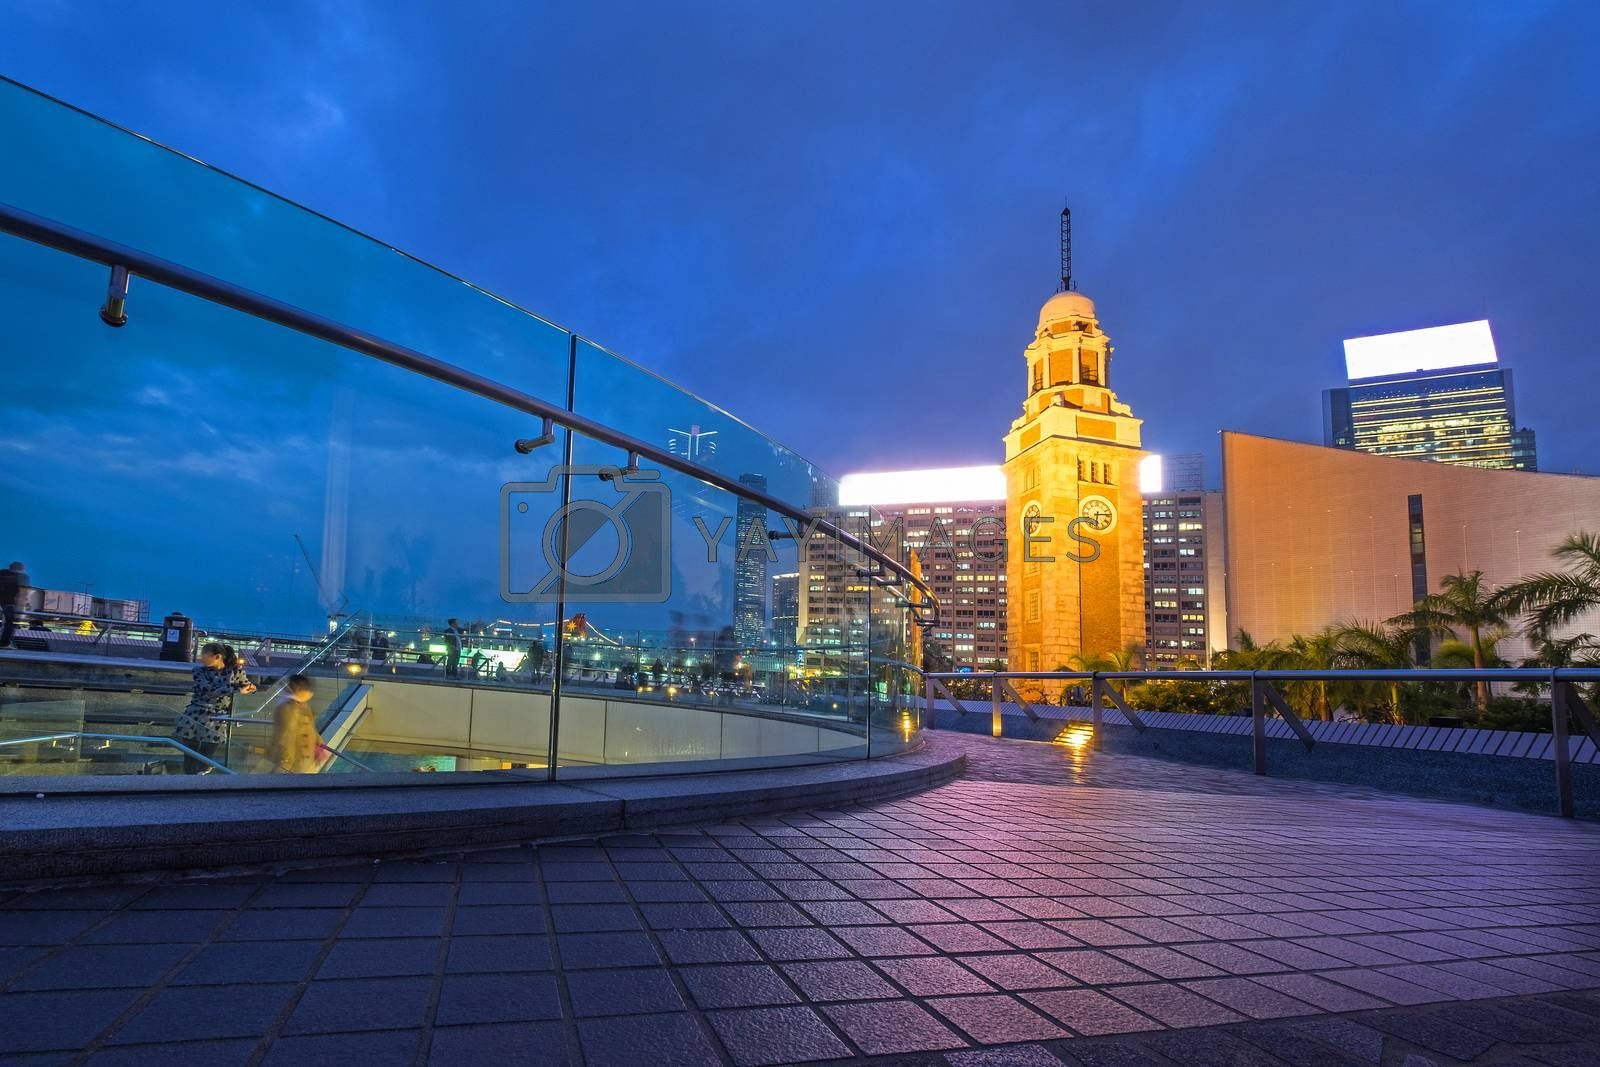 Night view Old Clock Tower in Hong Kong